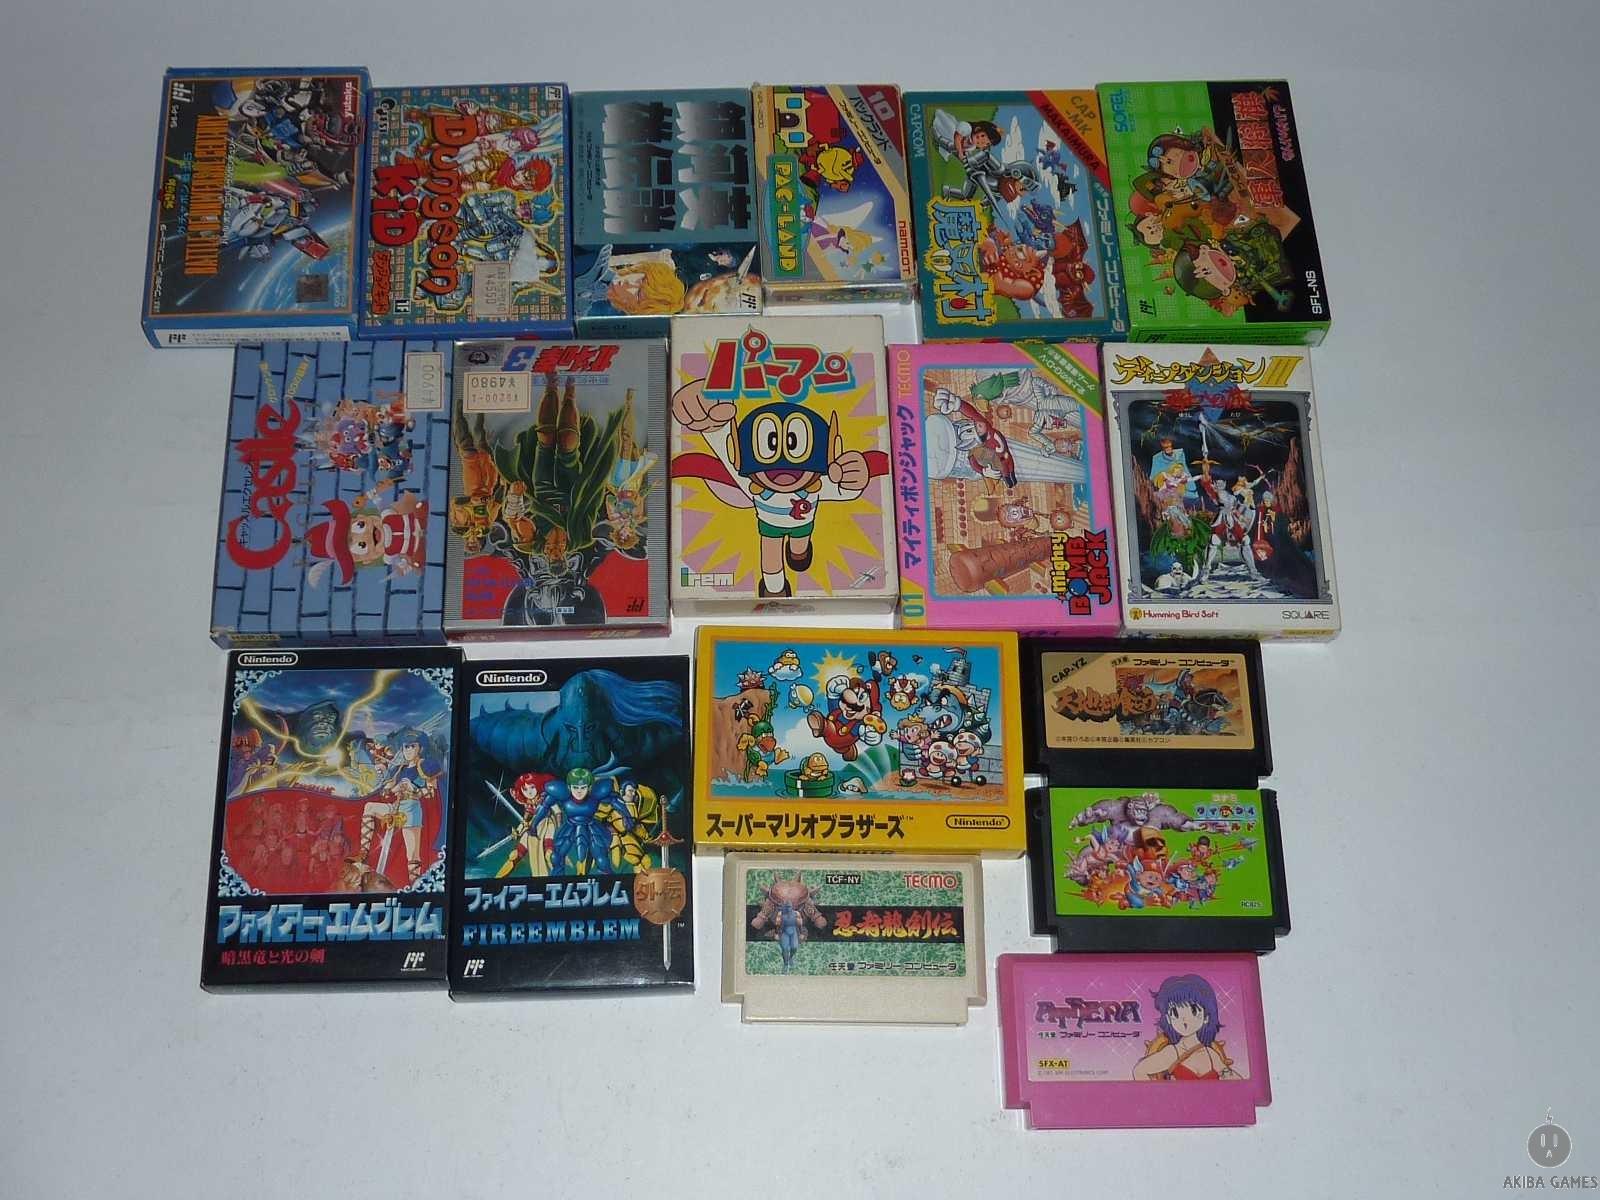 [FC] Ninja Yukenden Athena Super Mario Bros,Pac-land...etc 18 game set Mixed